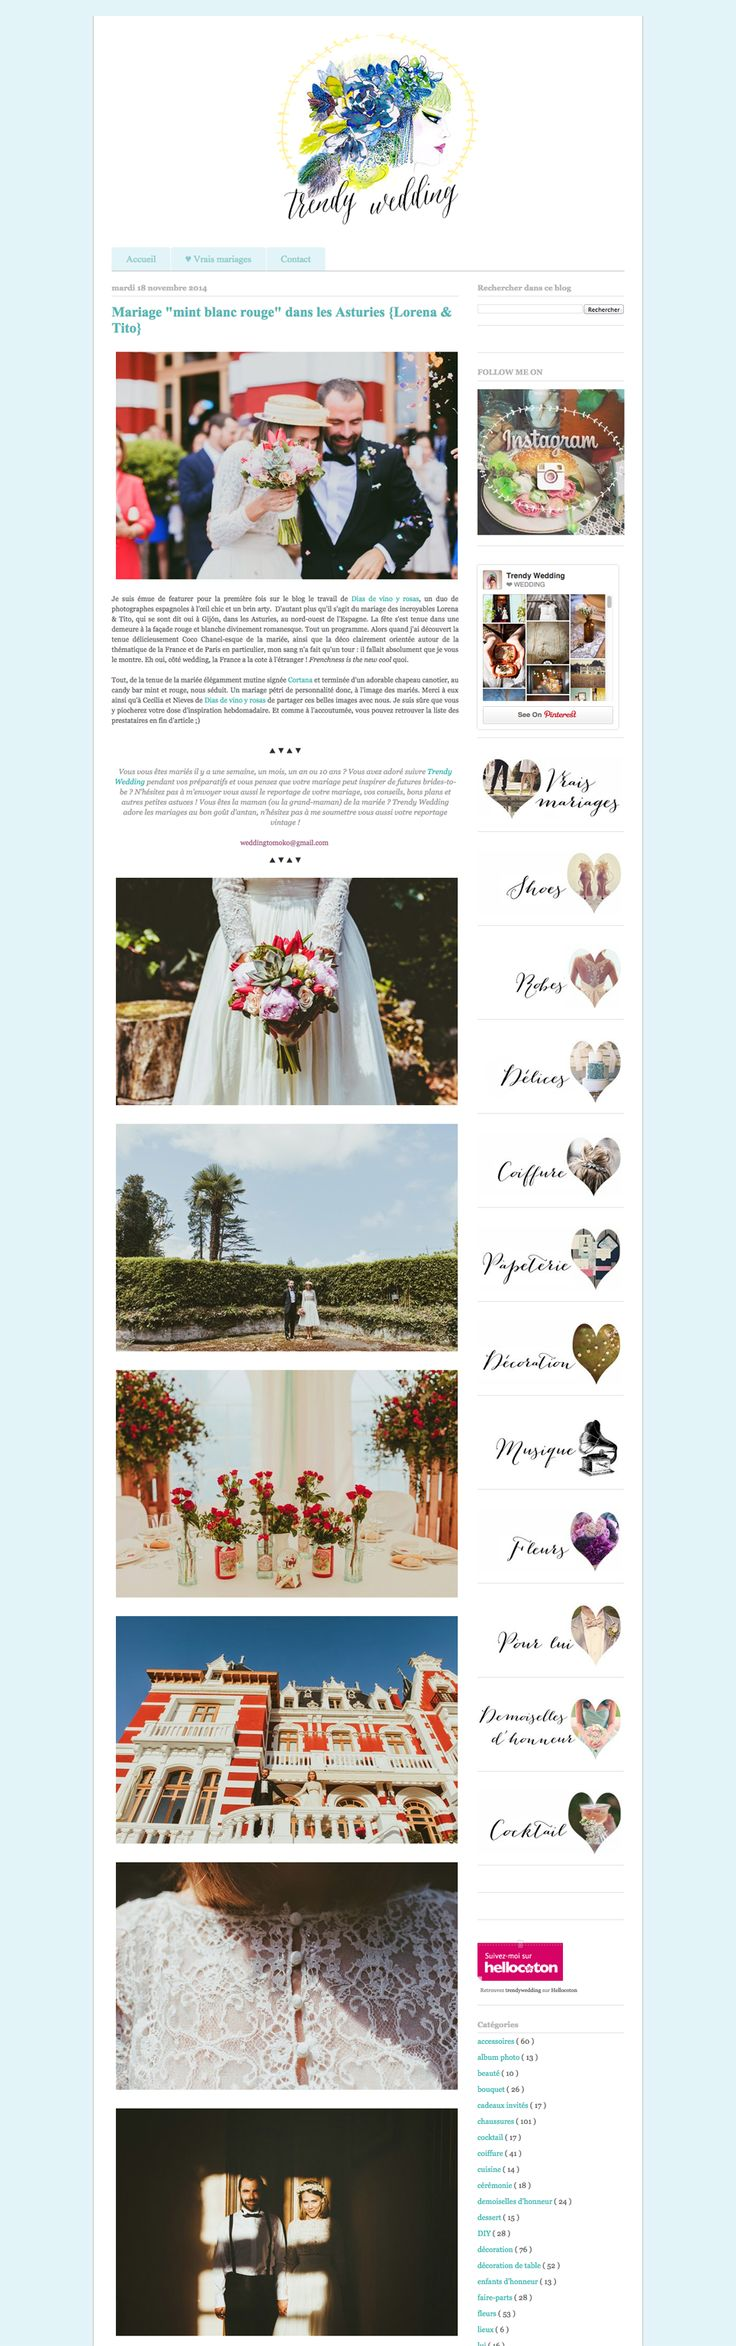 Featured in 'Trendy Weddings, le blog':  http://www.trendyweddingleblog.com/2014/11/mariage-chic-retro-asturies.html